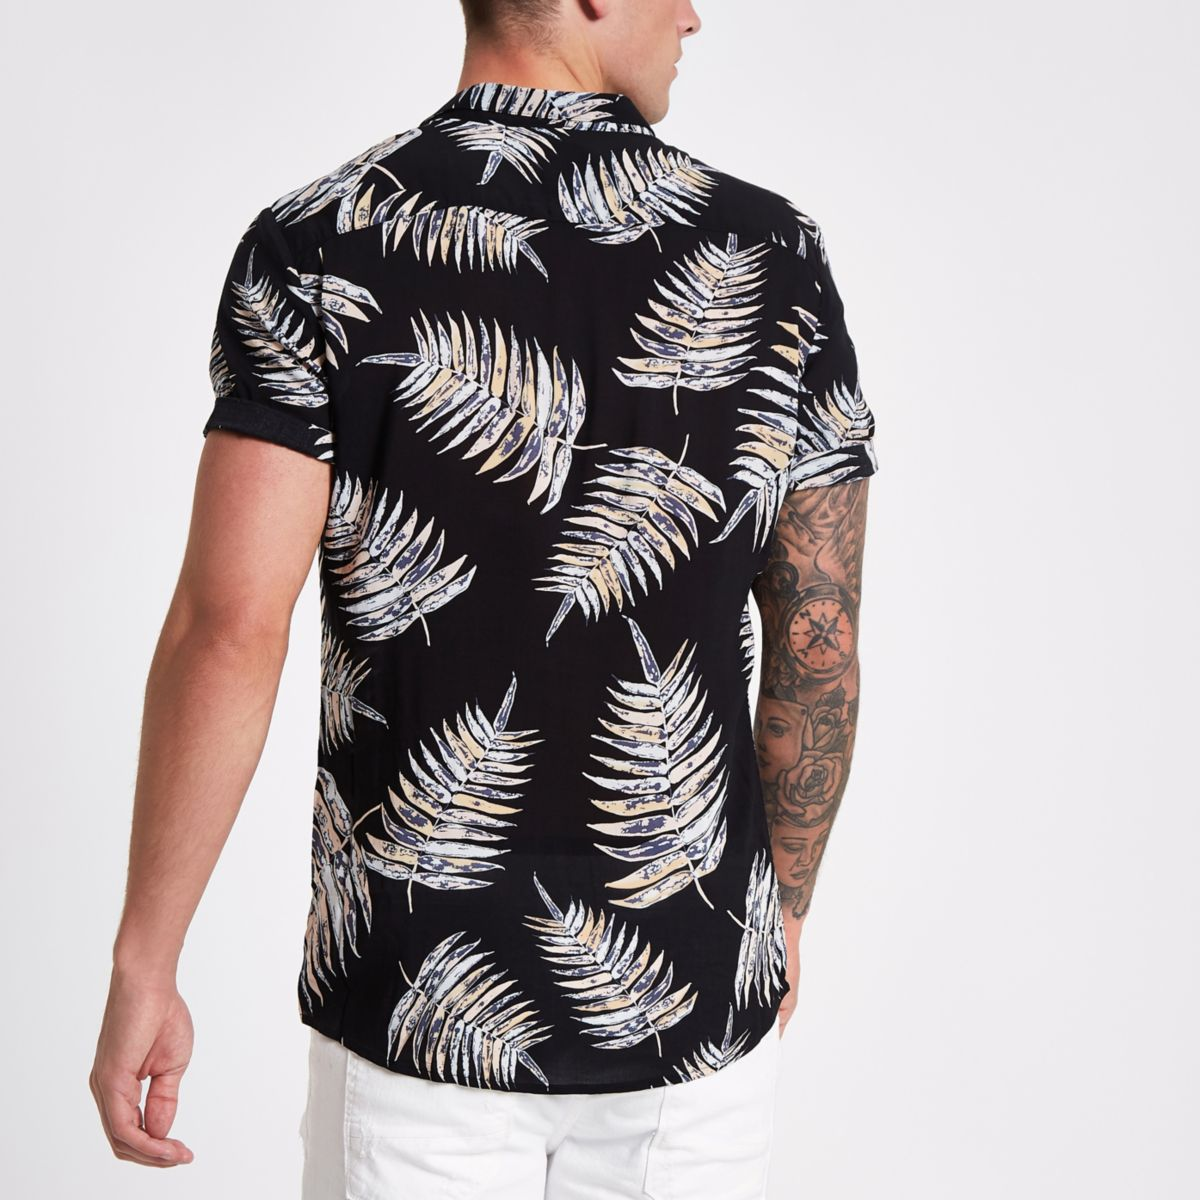 Black Leaf Print Slim Fit Revere Shirt by River Island